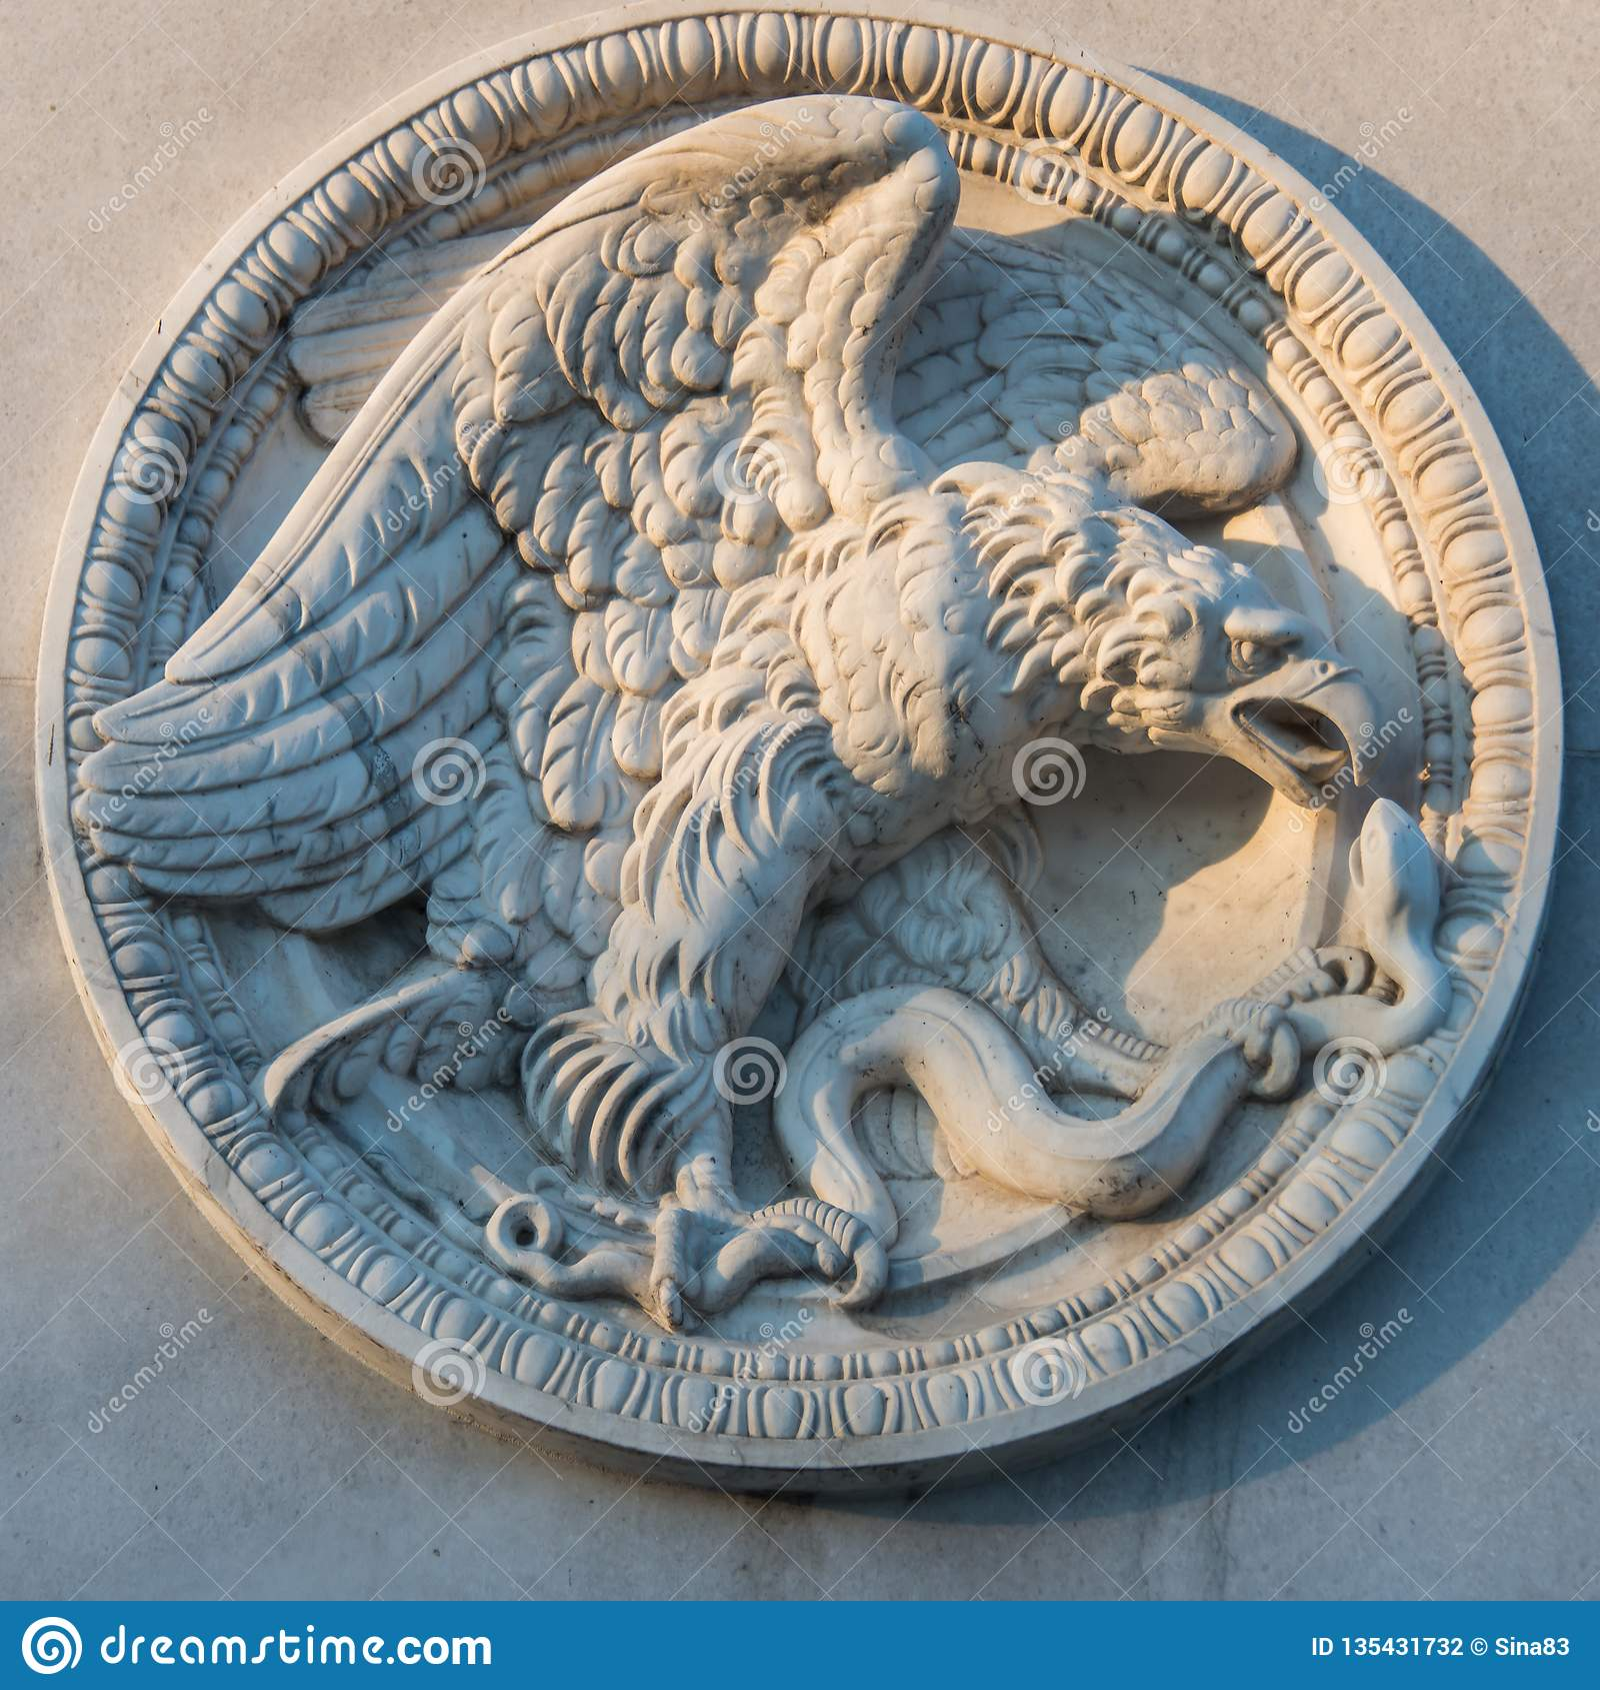 German round stone Eagle emblem